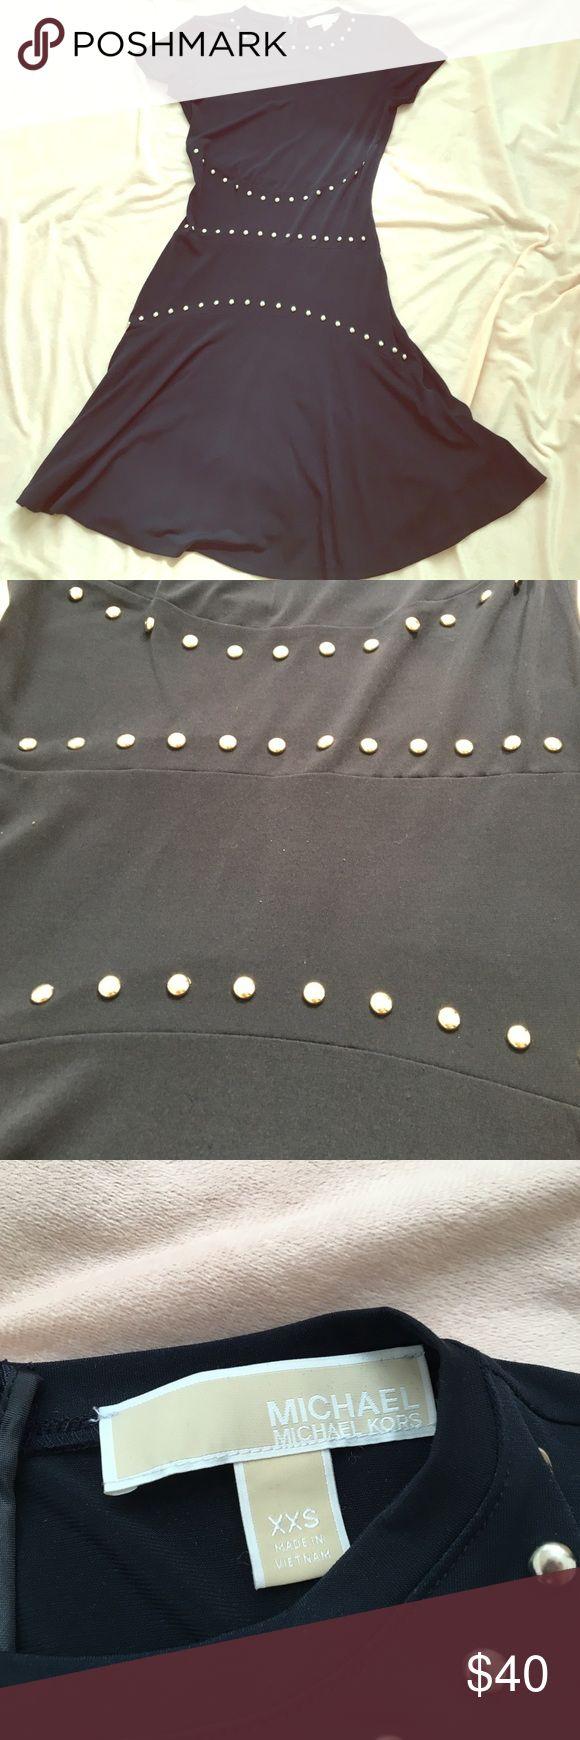 Michael Kors navy skater dress Gently used studded skater dress. Size XXS fits like XS. Stretchy material. Michael Kors Dresses Midi